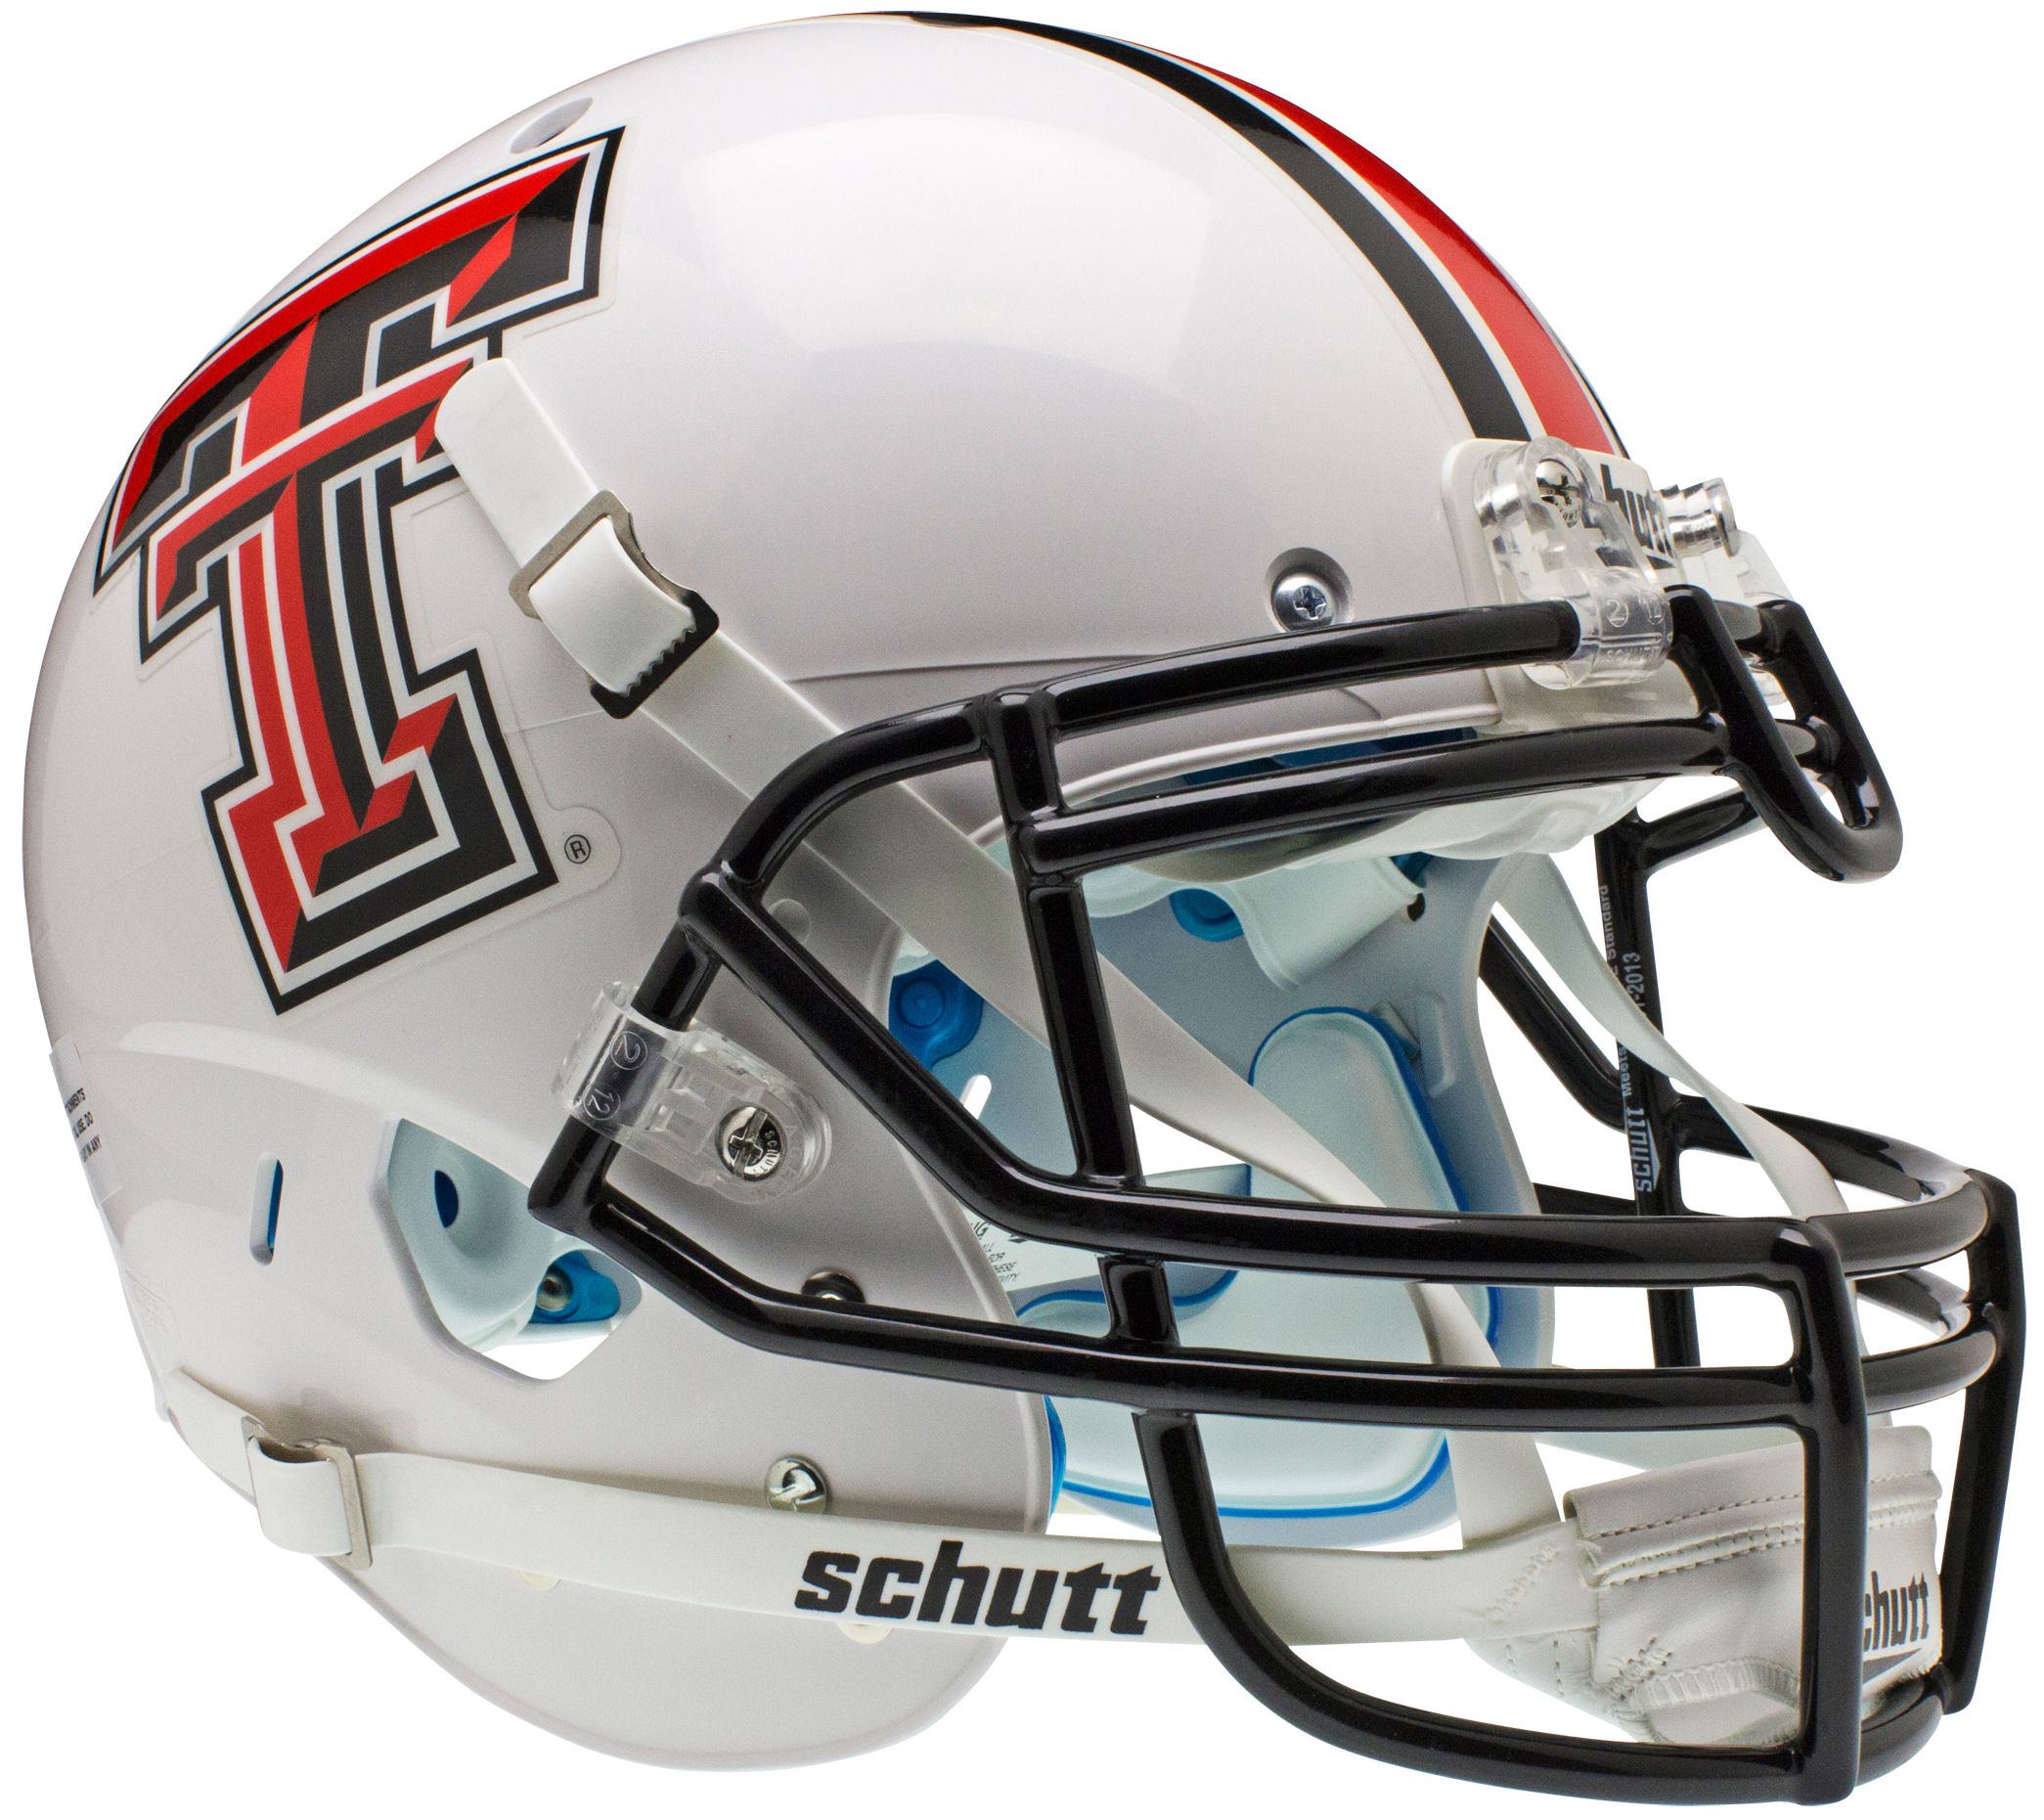 Texas Tech Red Raiders Authentic College XP Football Helmet Schutt <B>White</B>